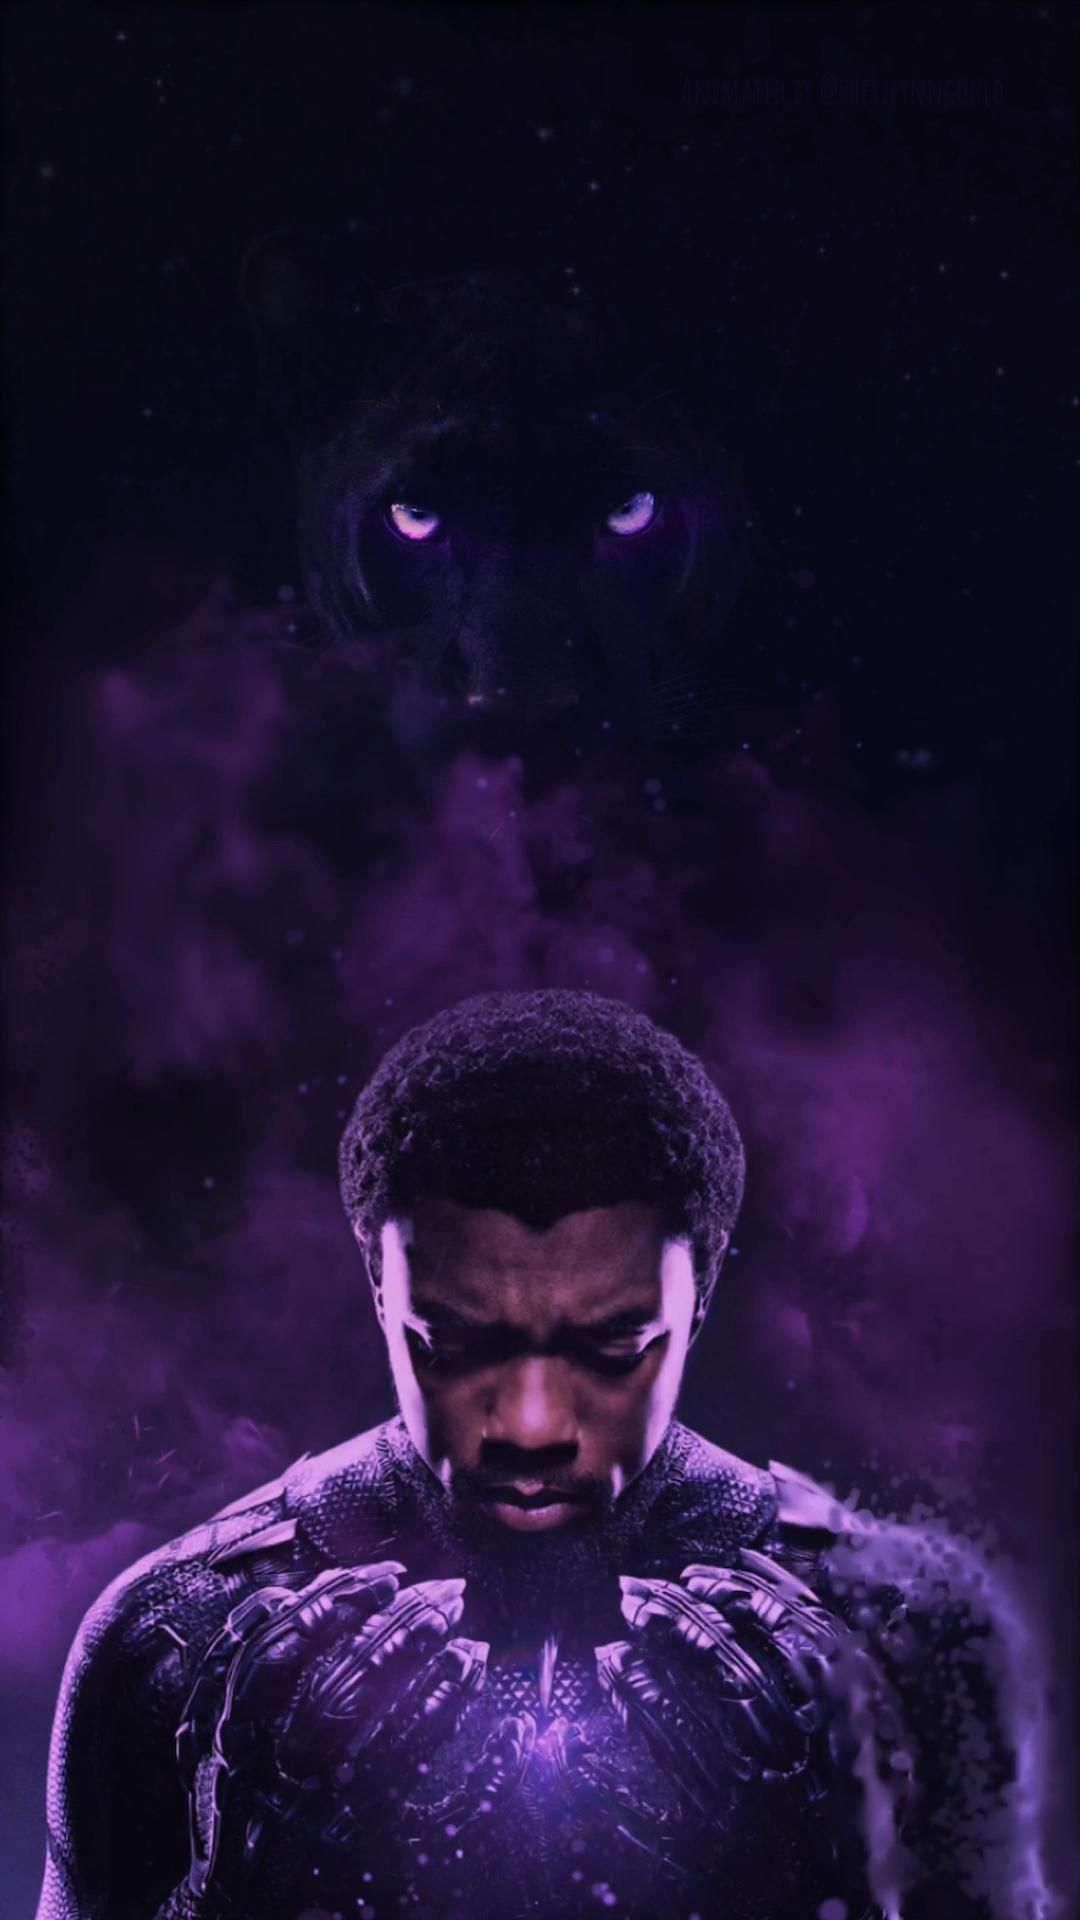 Animated Video Gif Live Wallpaper Marvel Black Panther Video Black Panther Marvel Black Panther Art Marvel Superhero Posters